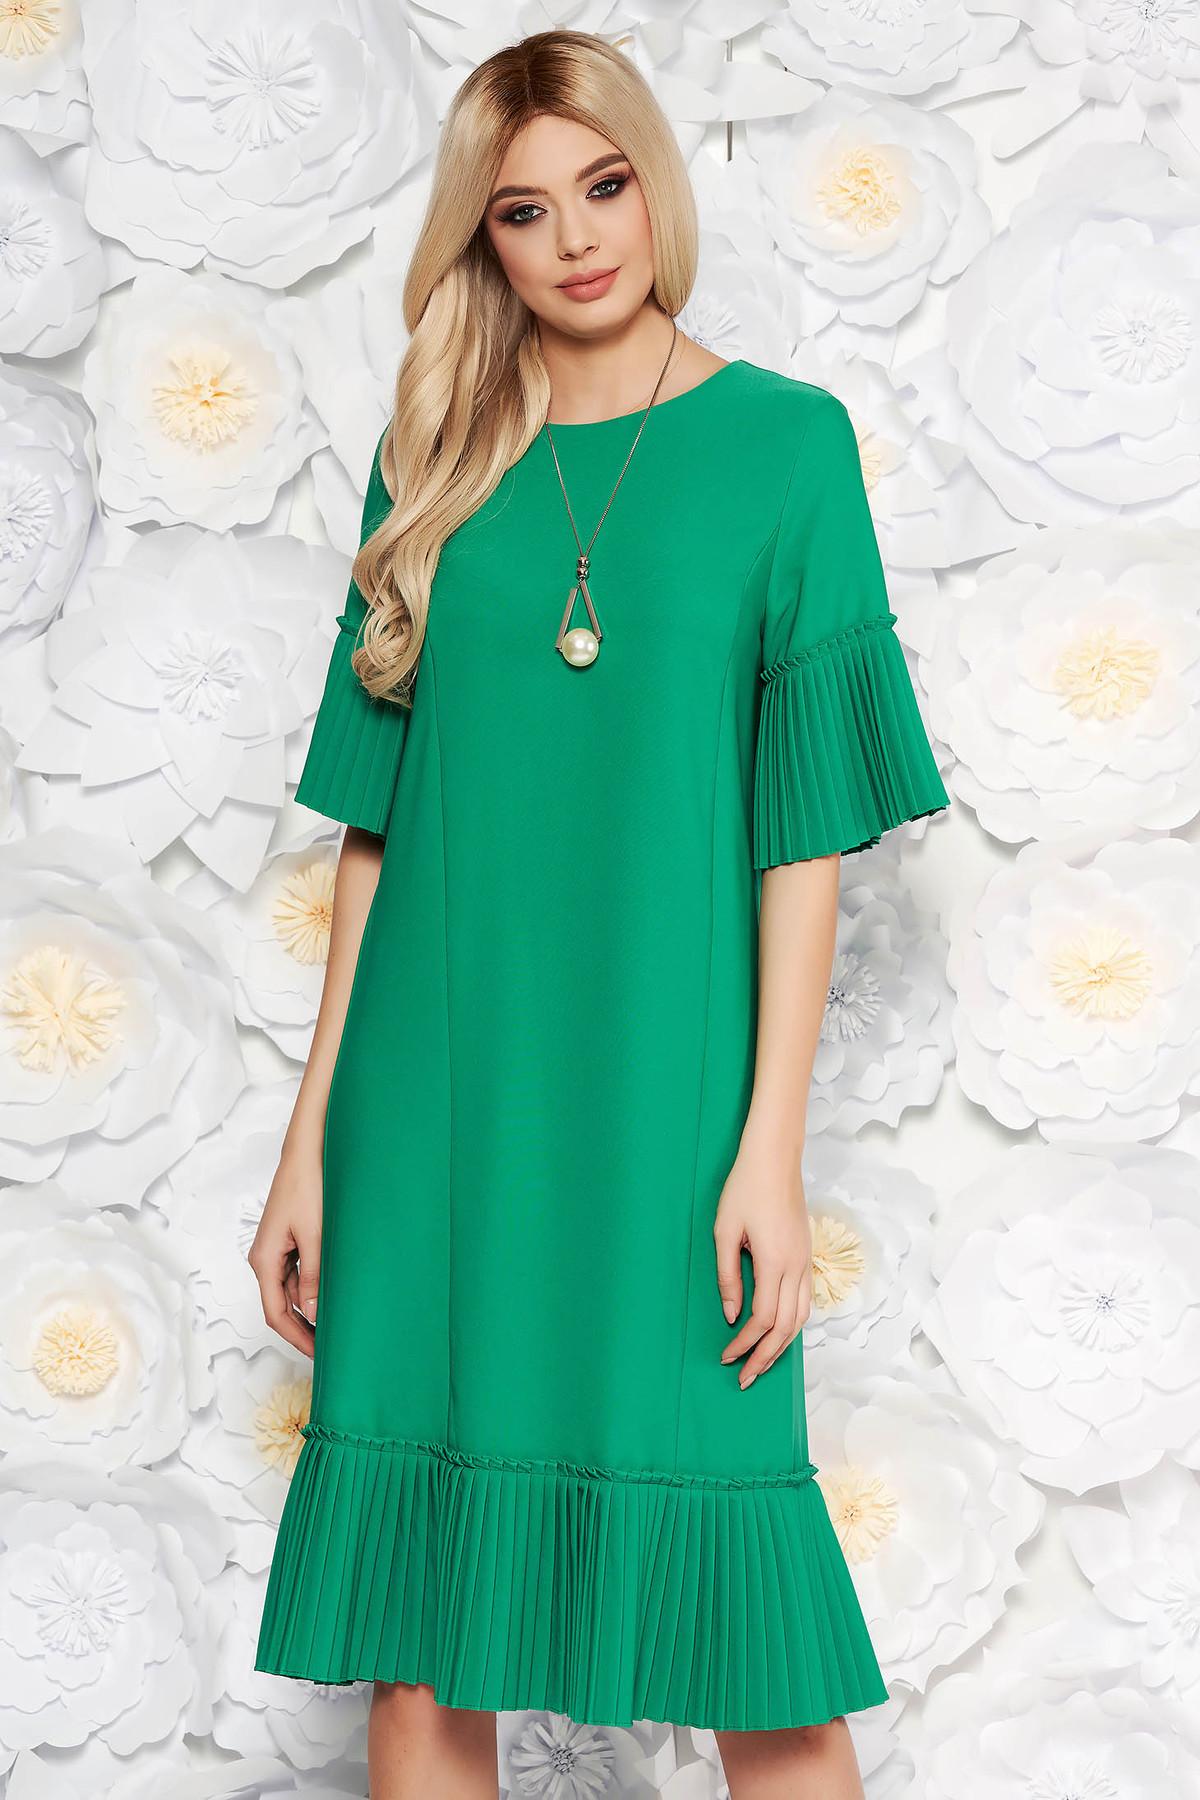 Rochie verde eleganta midi cu un croi drept din stofa usor elastica